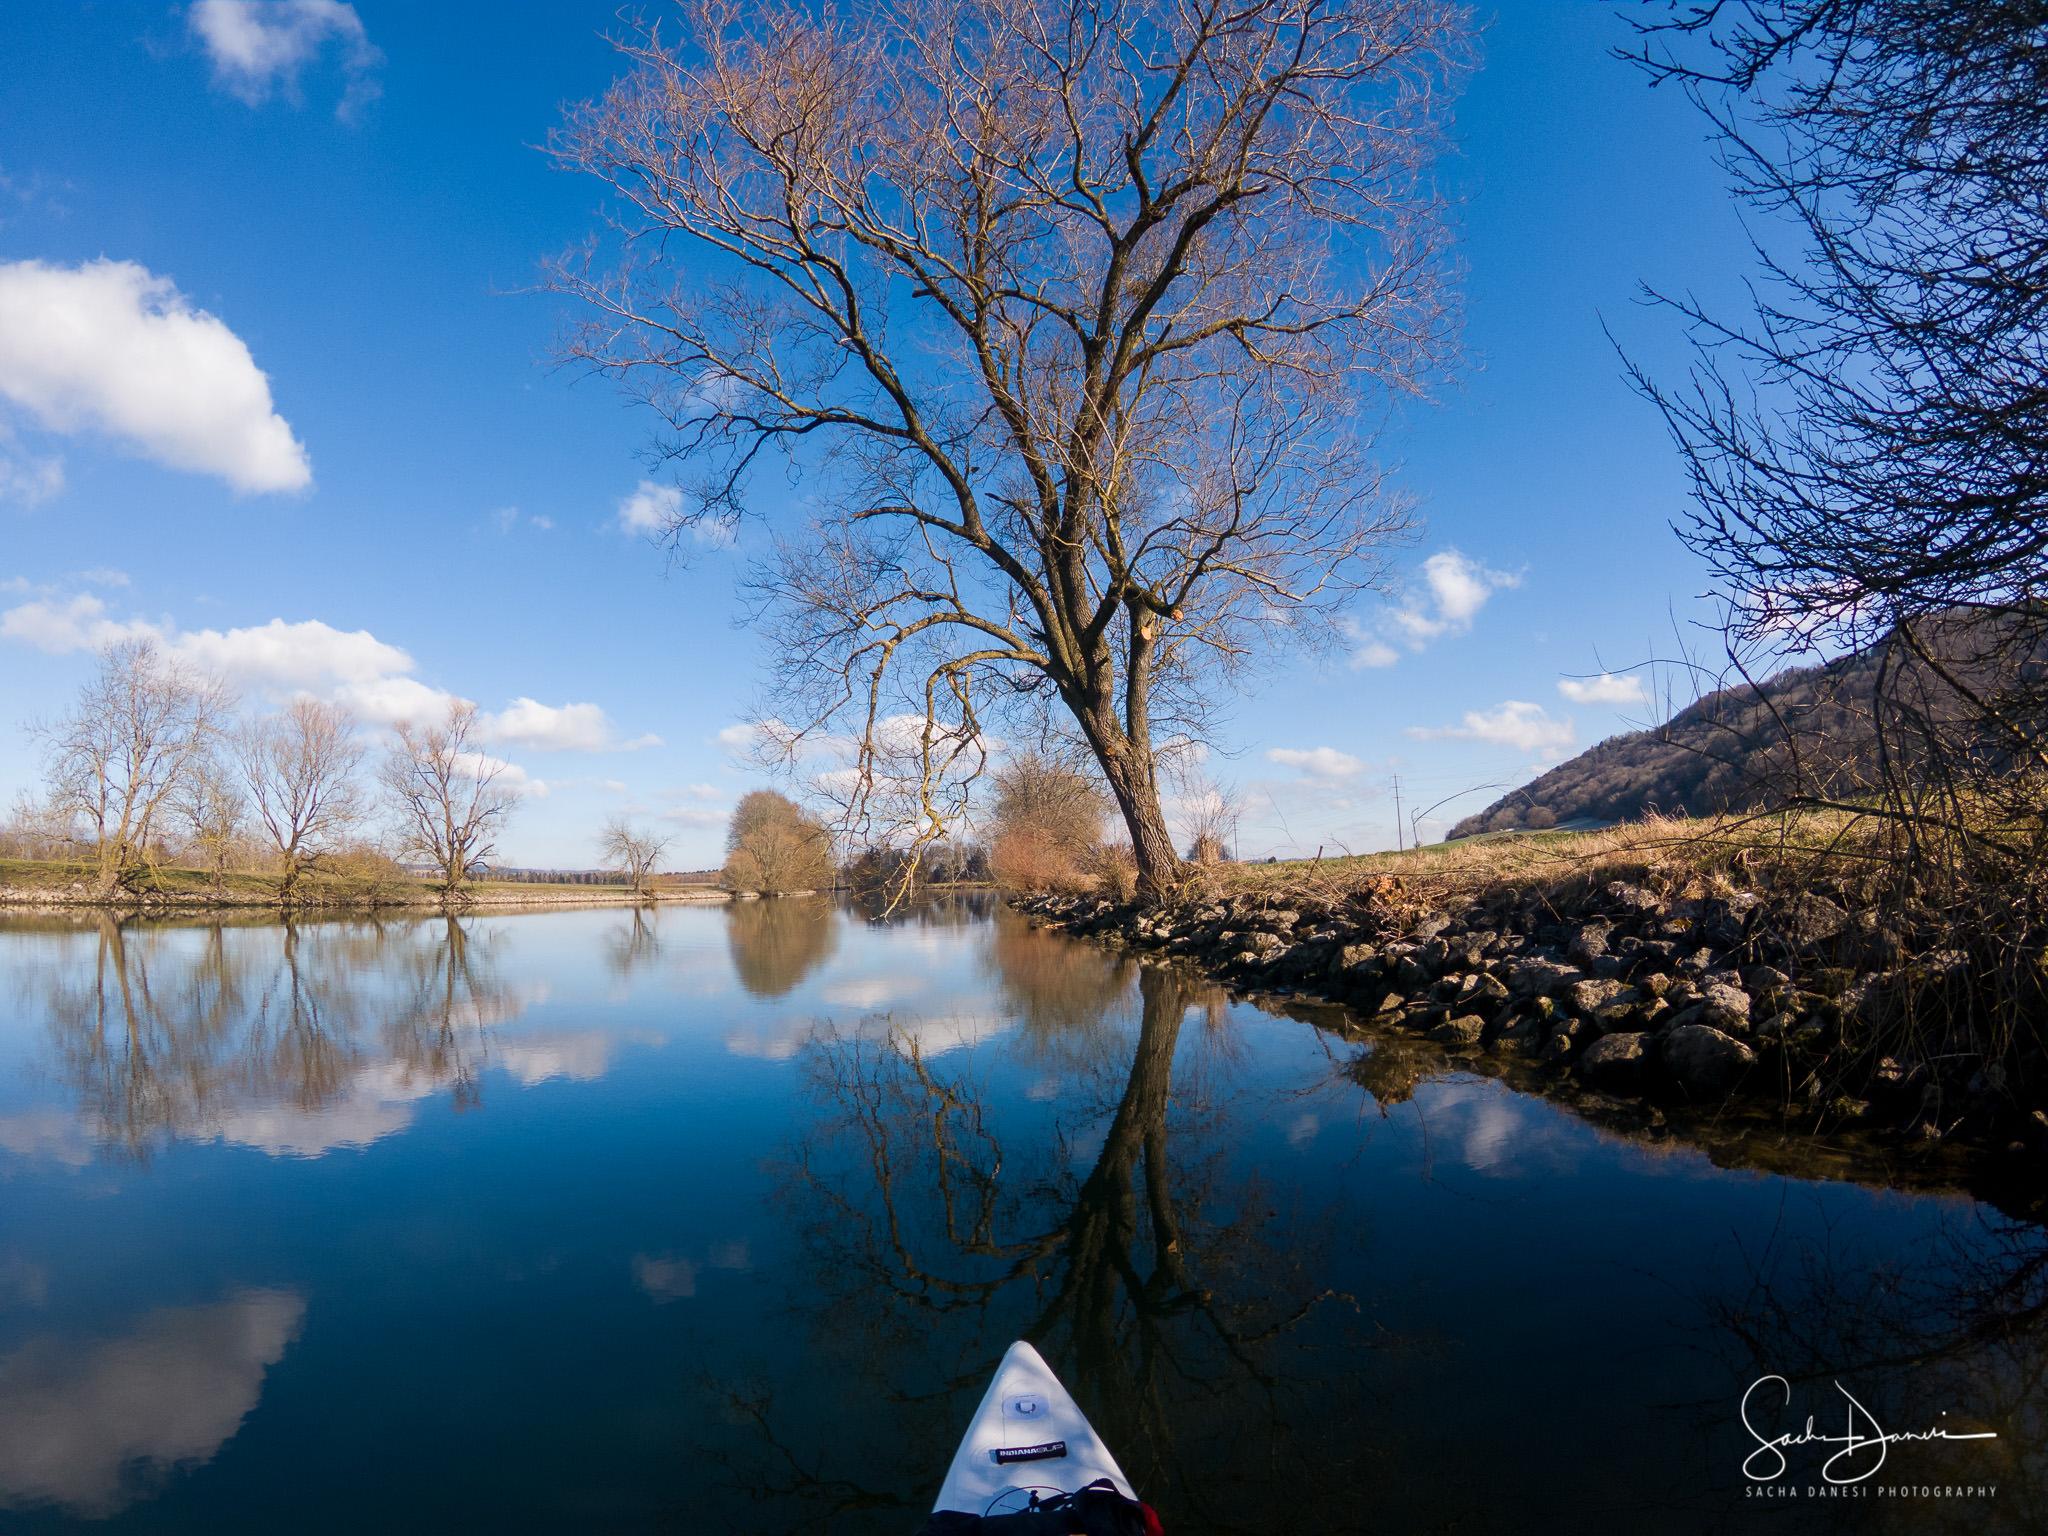 SUP auf dem Broye Kanal